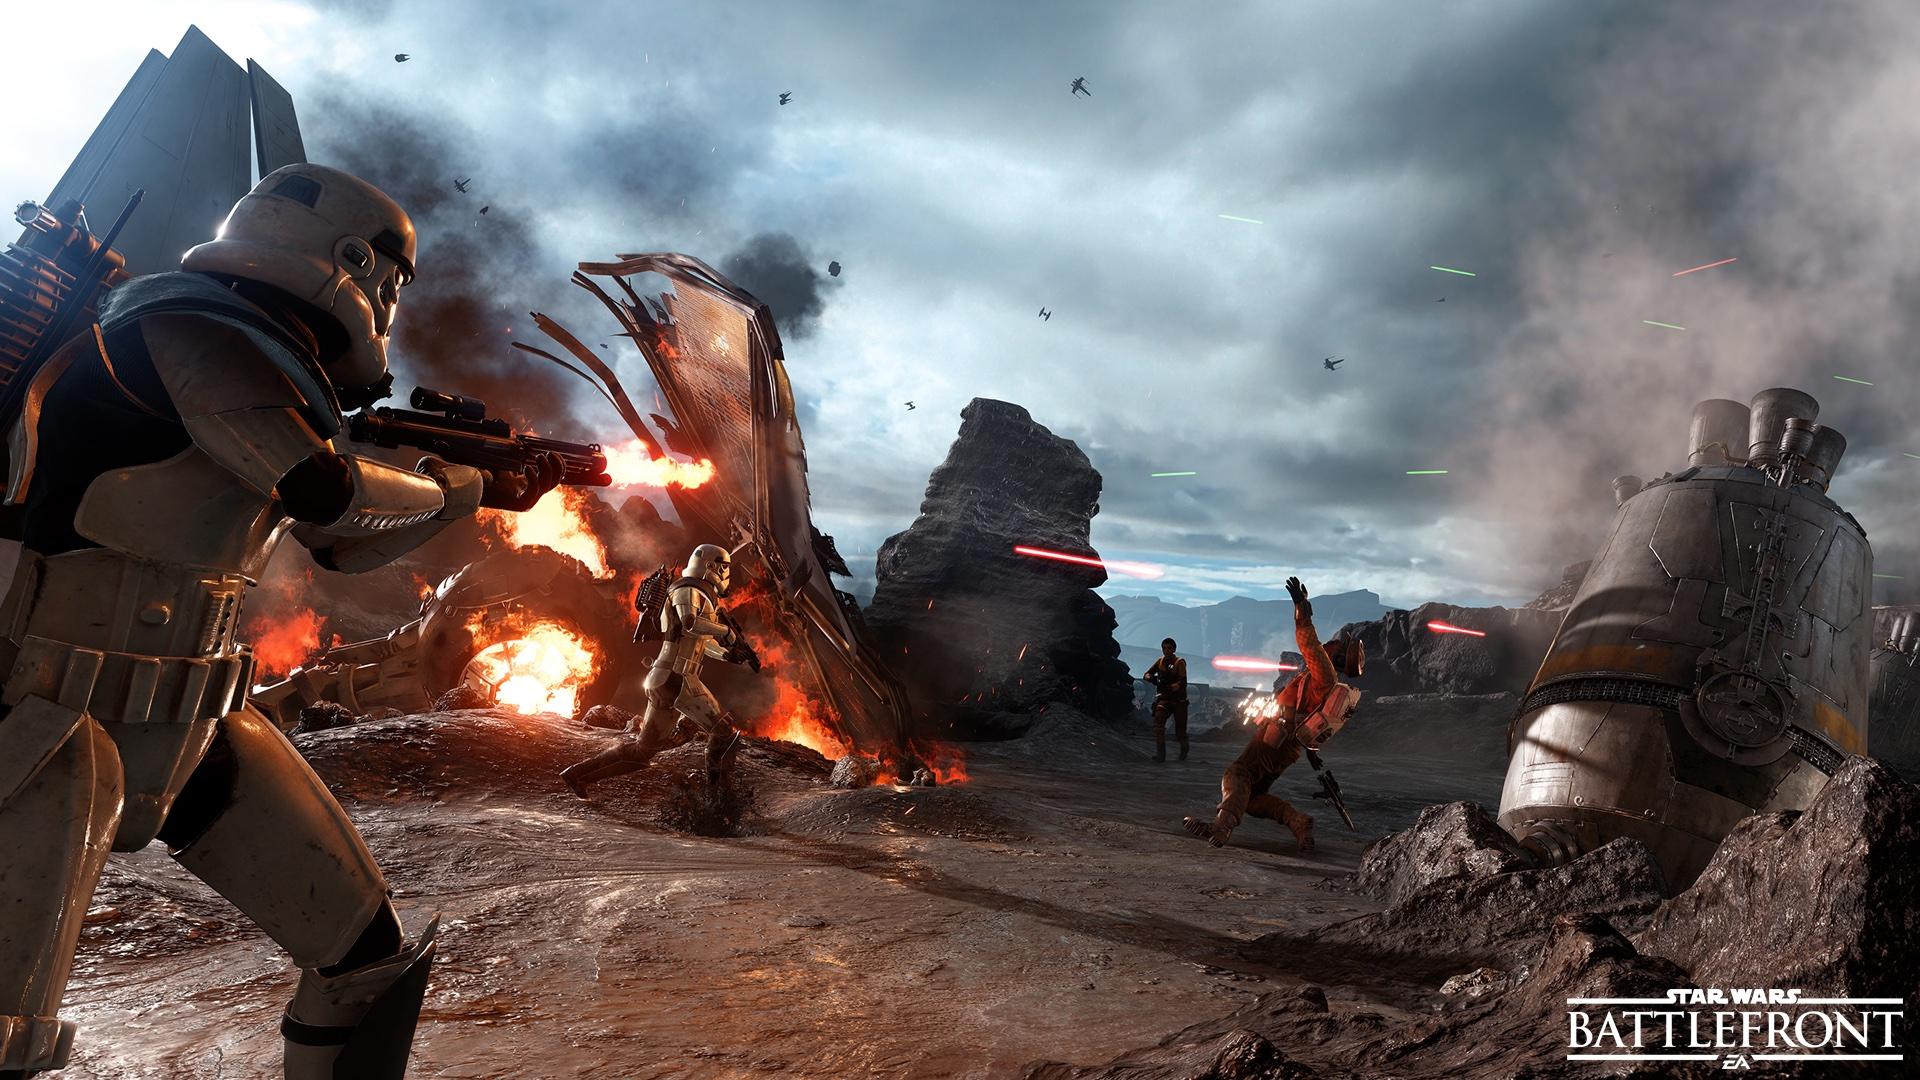 Star Wars Battlefront joins EA and Origin Access next week